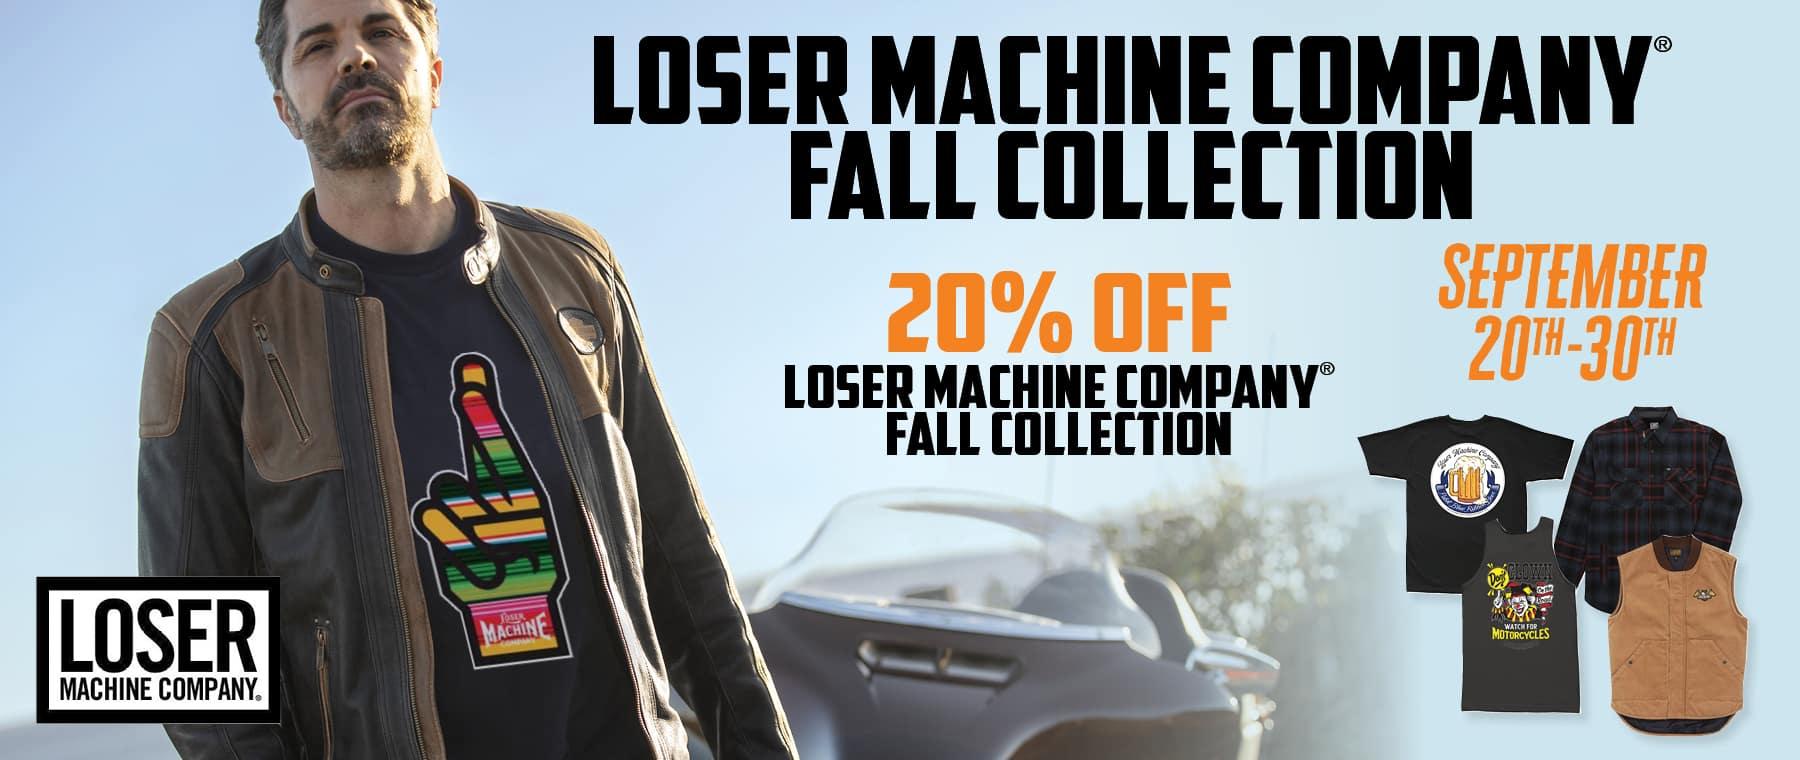 CA01_09_21_Loser_Machine_Sale_1800x760_WebBnr